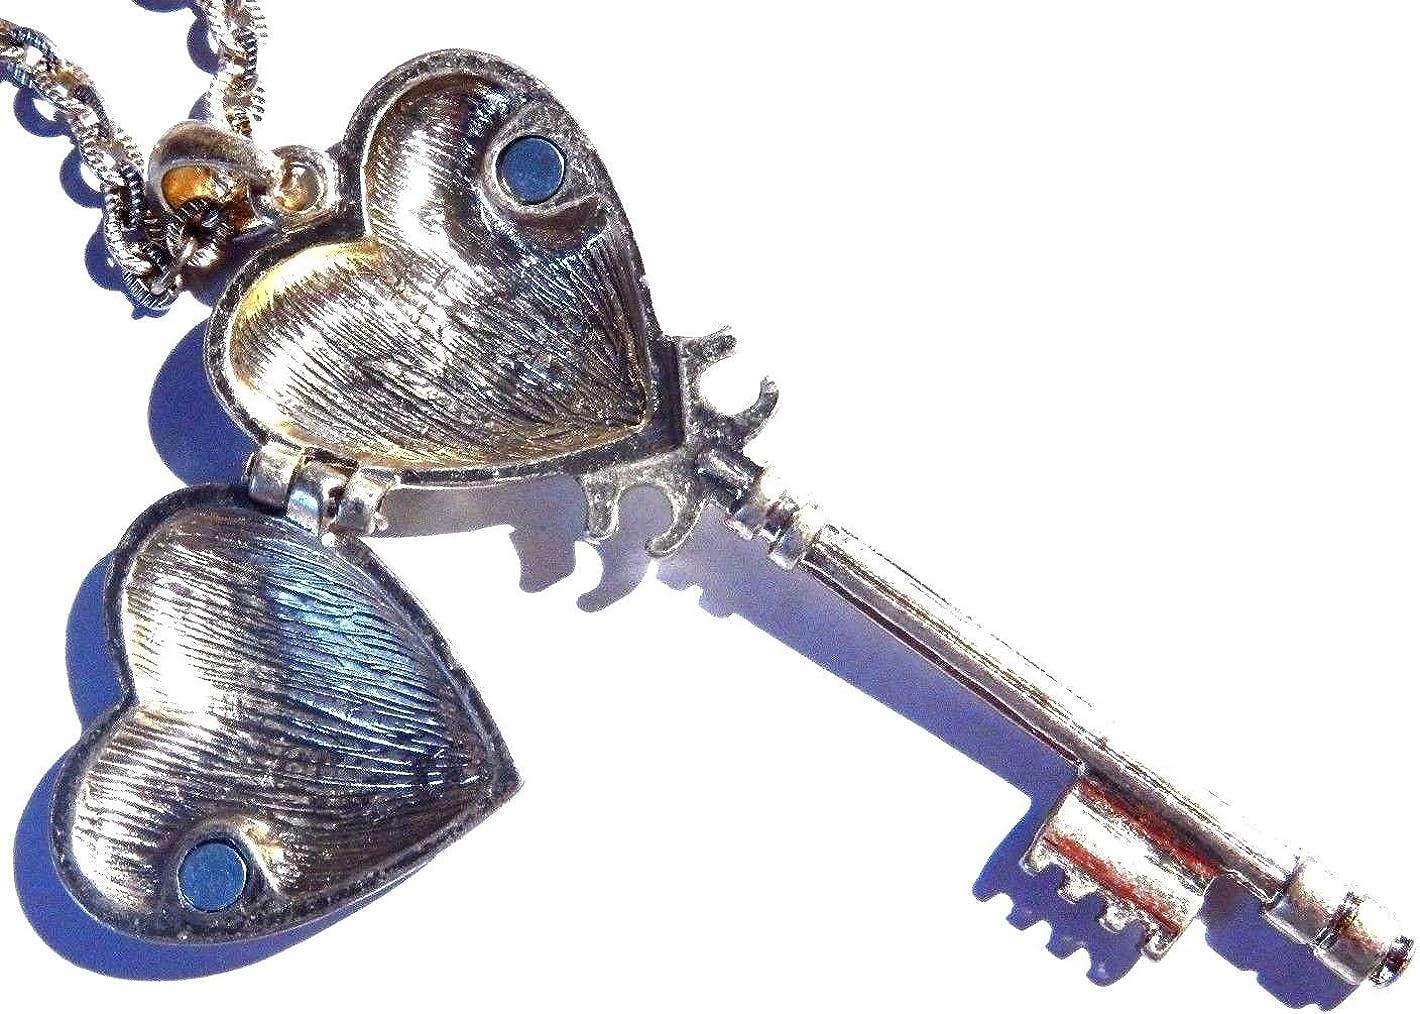 Antiqued Brassy Skeleton Key Shaped Heart Locket Pendant on Long Chain Necklace